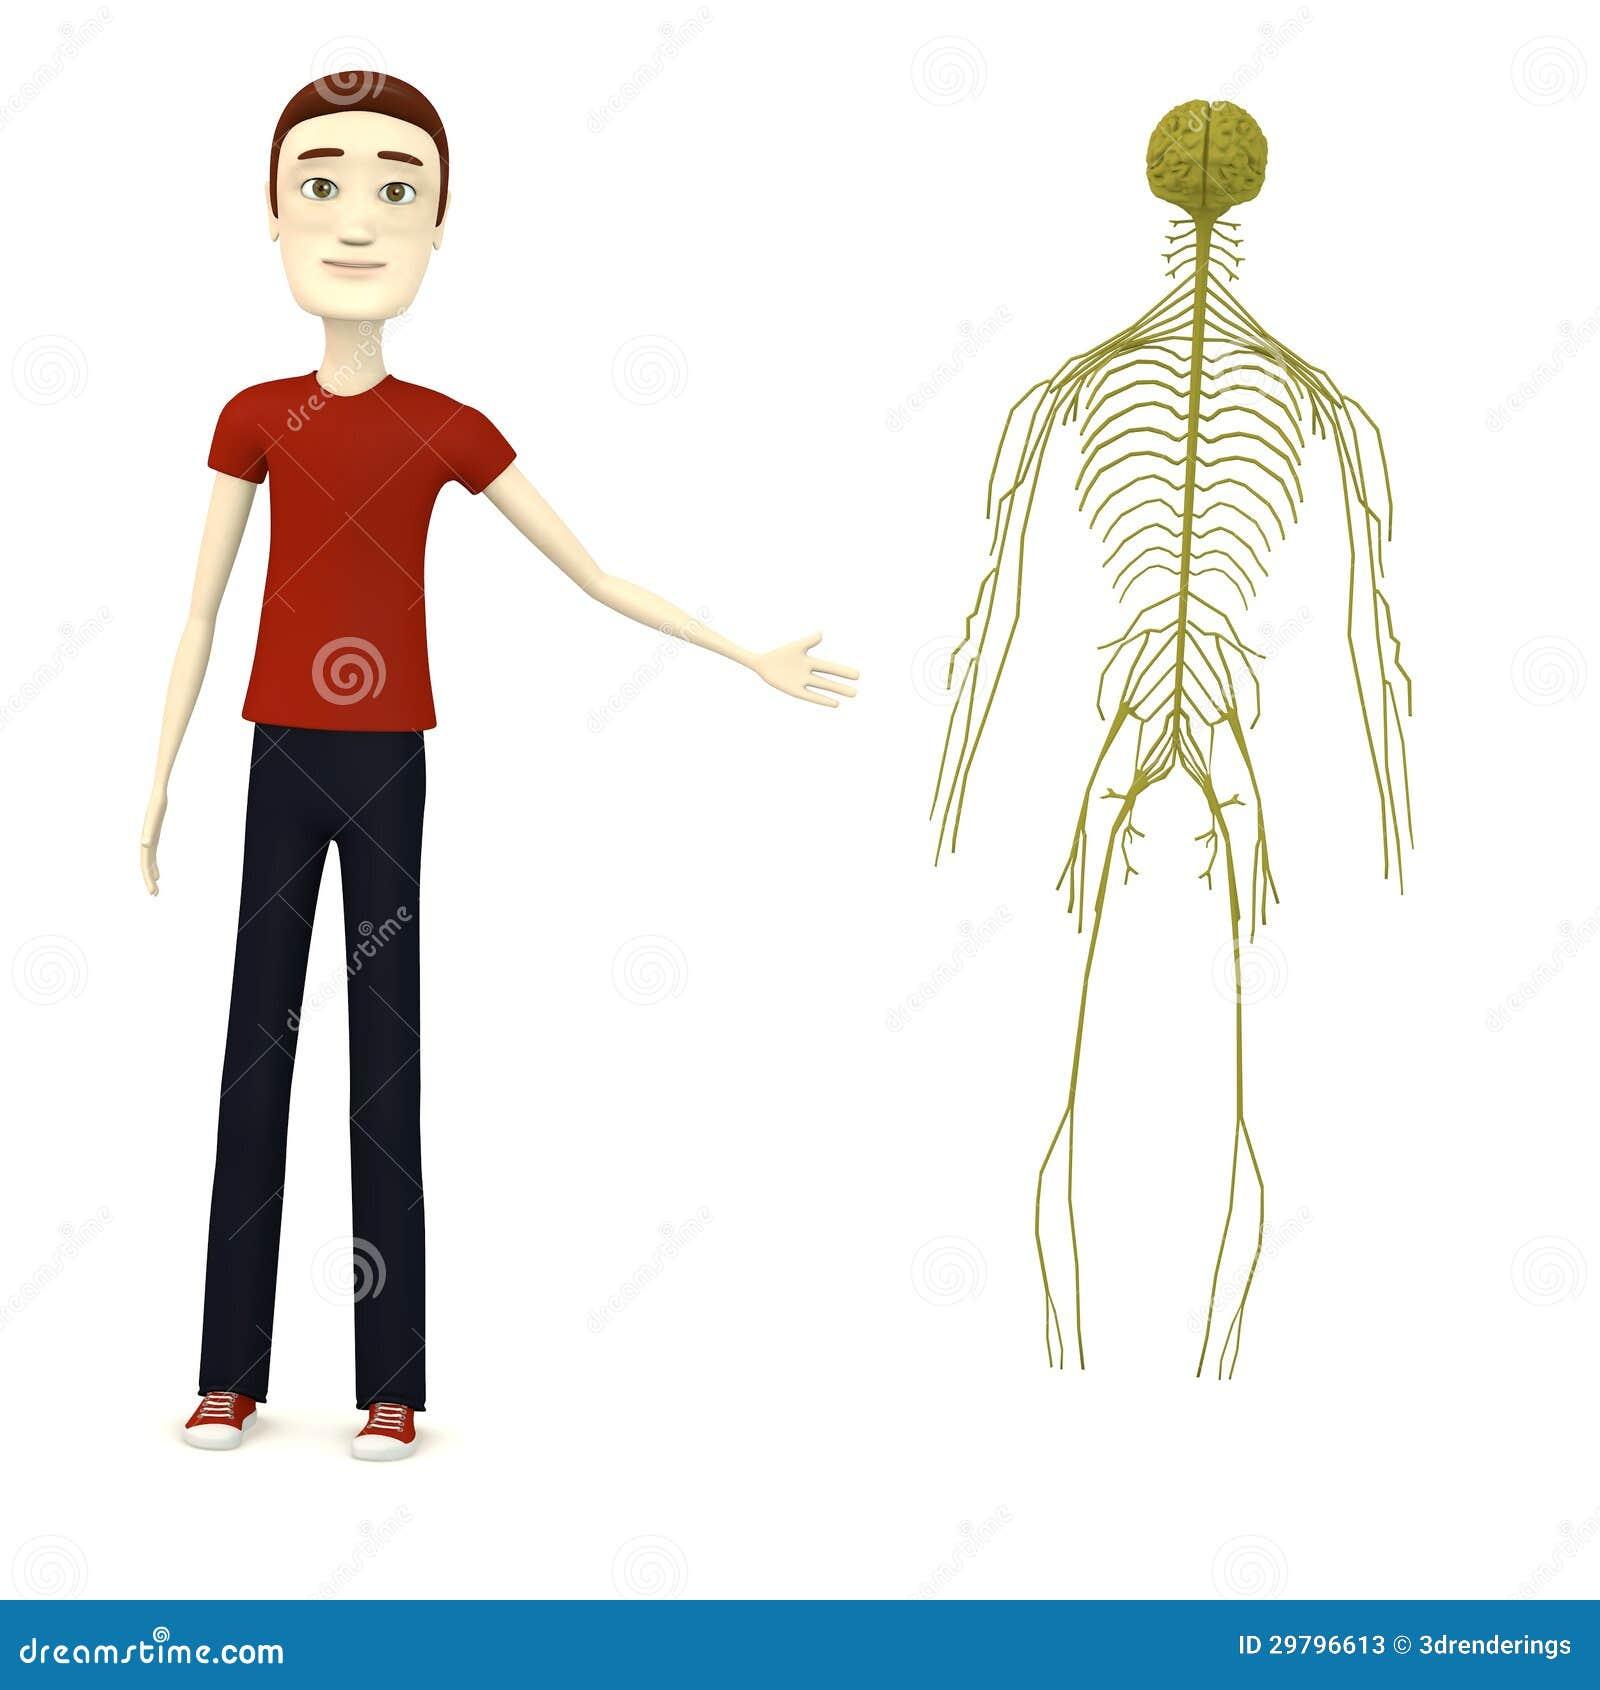 Stock Photos D Render Cartoon Boy Nervous System Image29796613